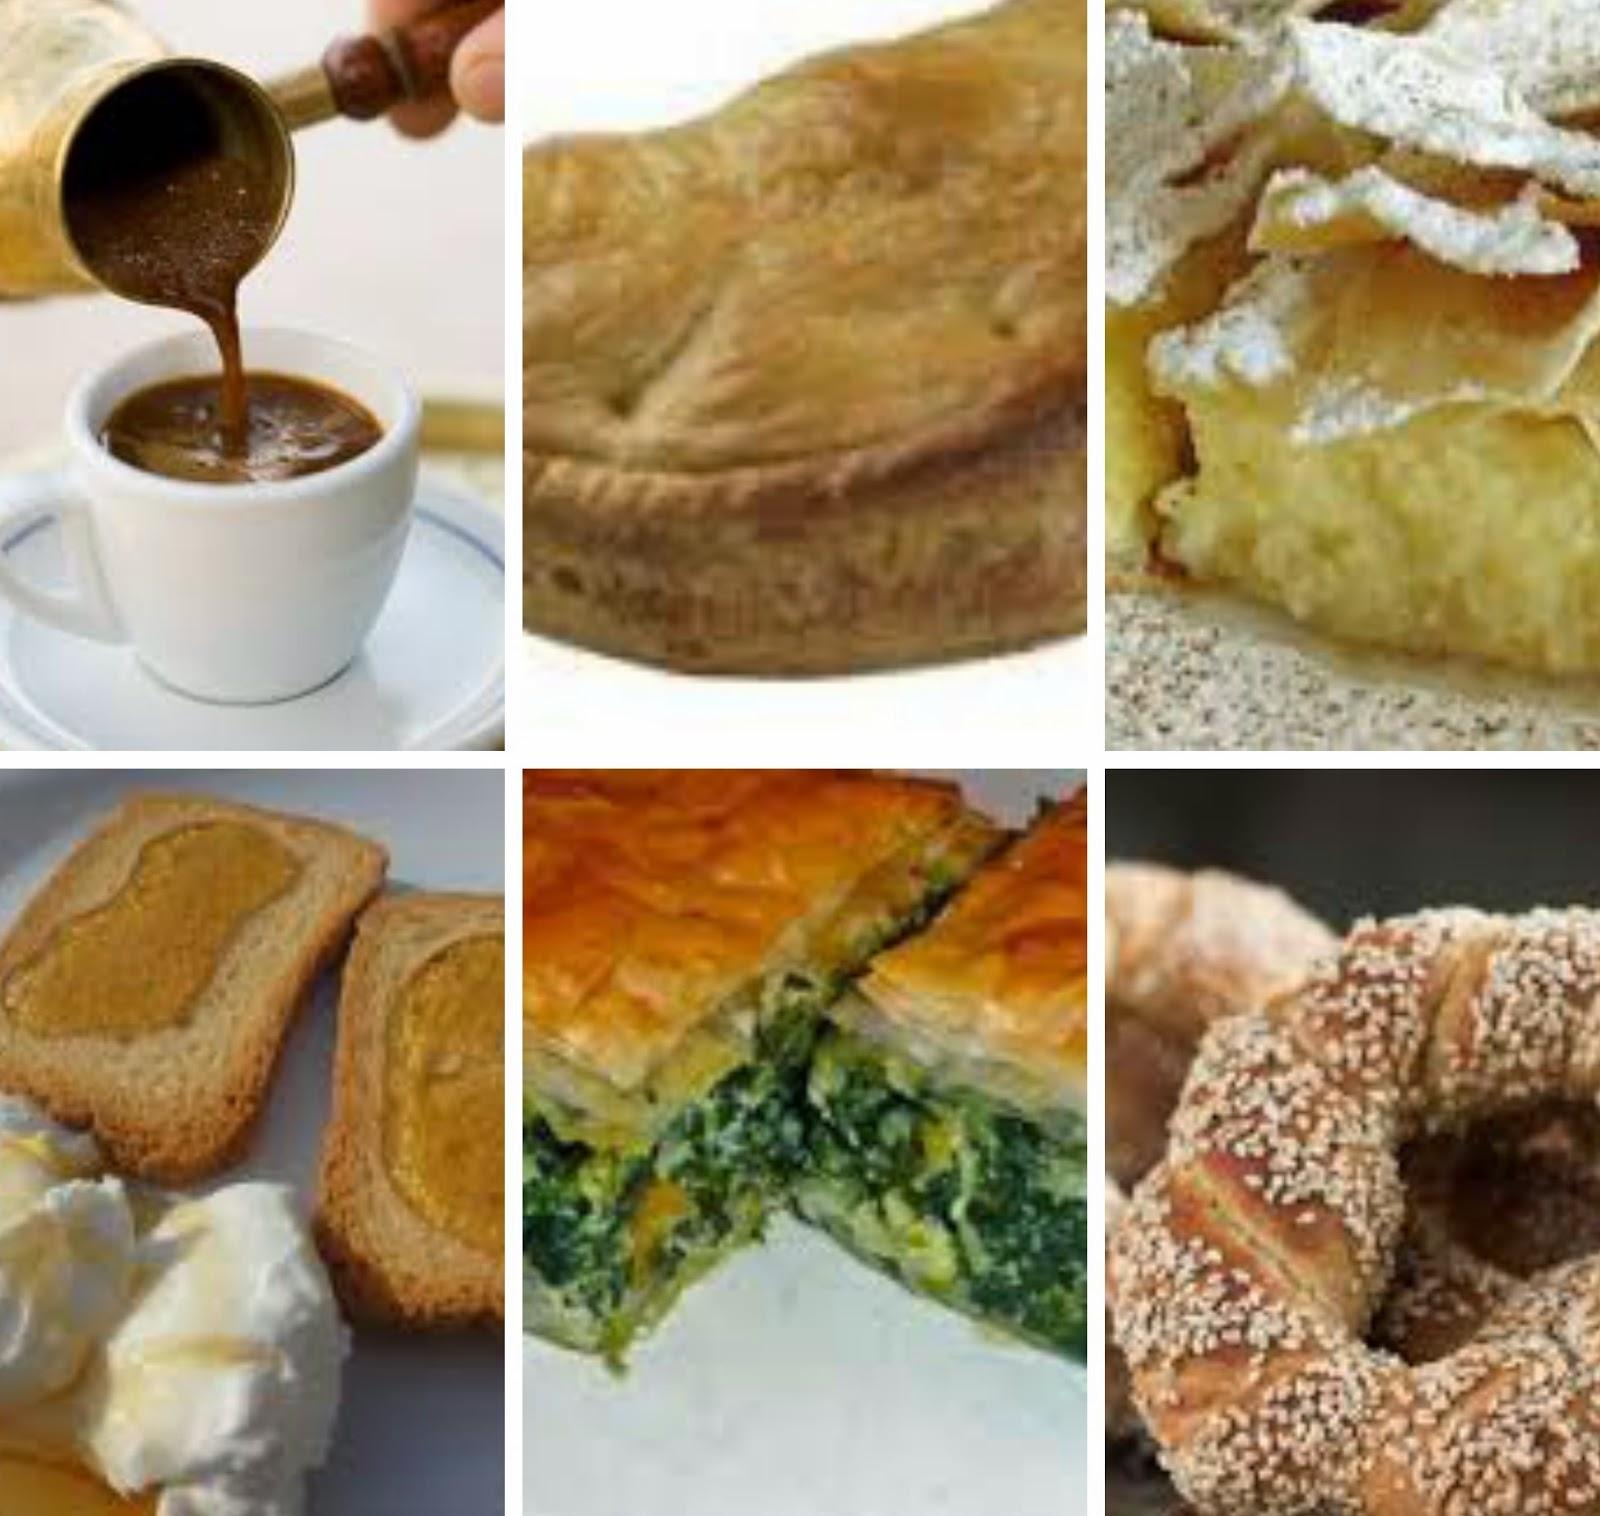 Greek breakfast choices